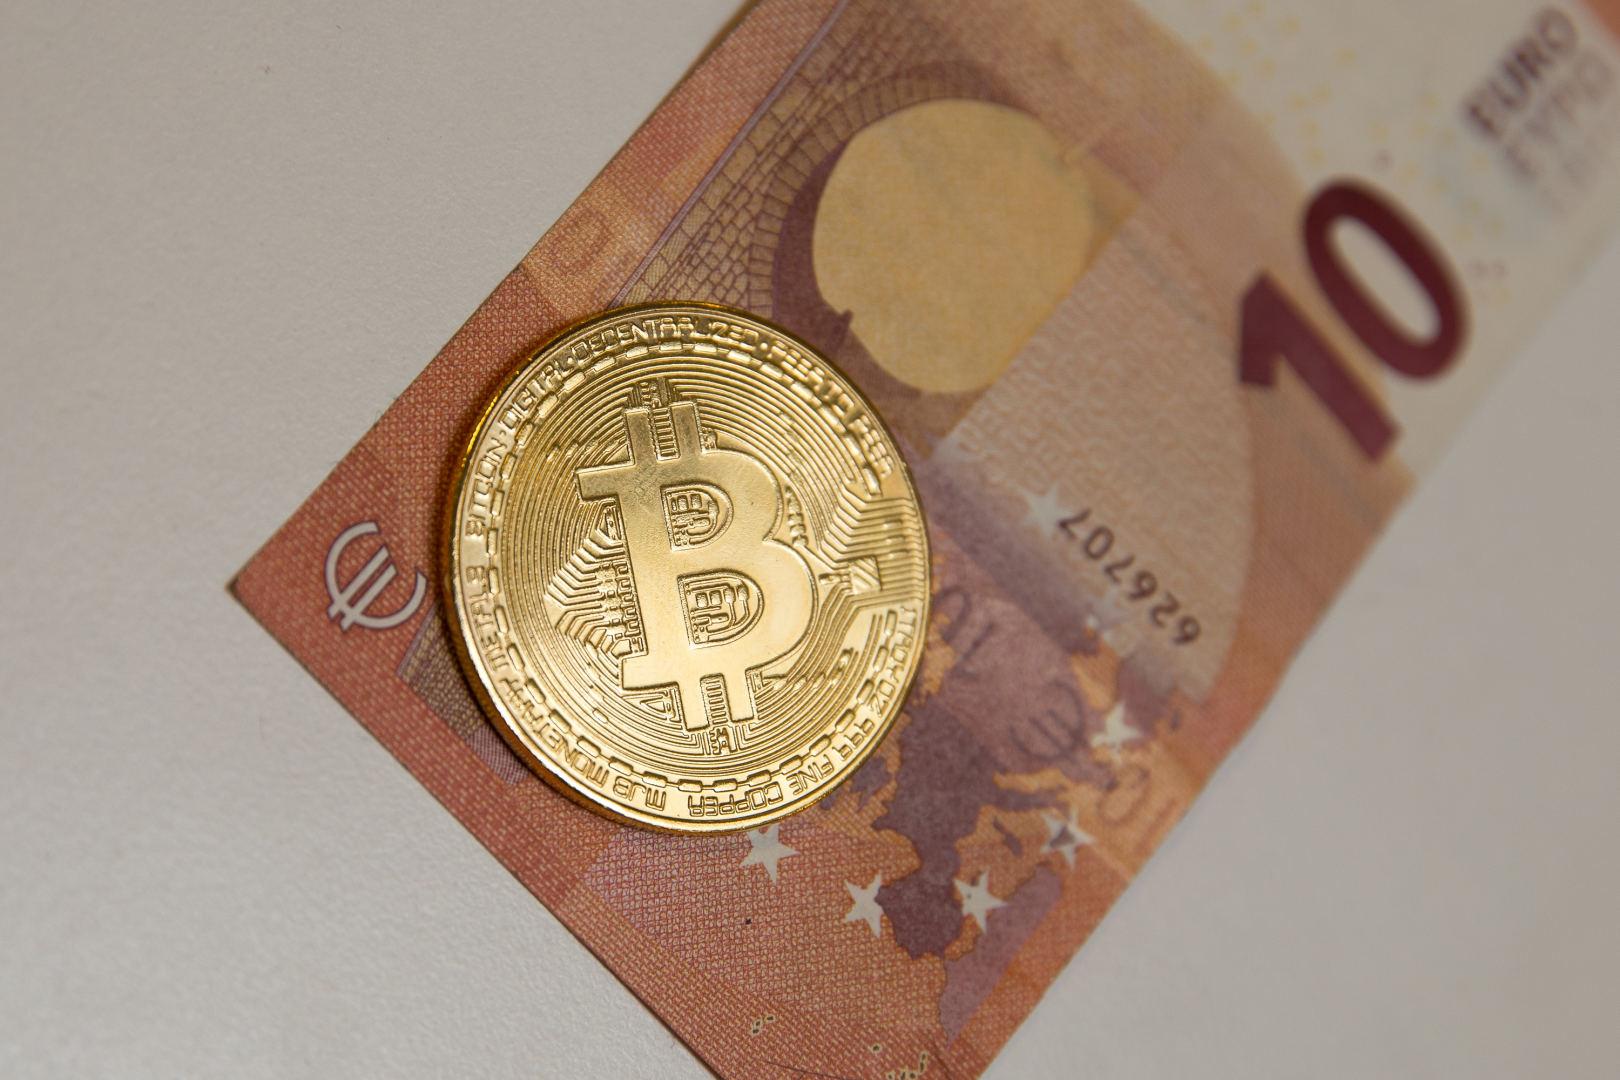 bitkoin prekybinink kaljimas